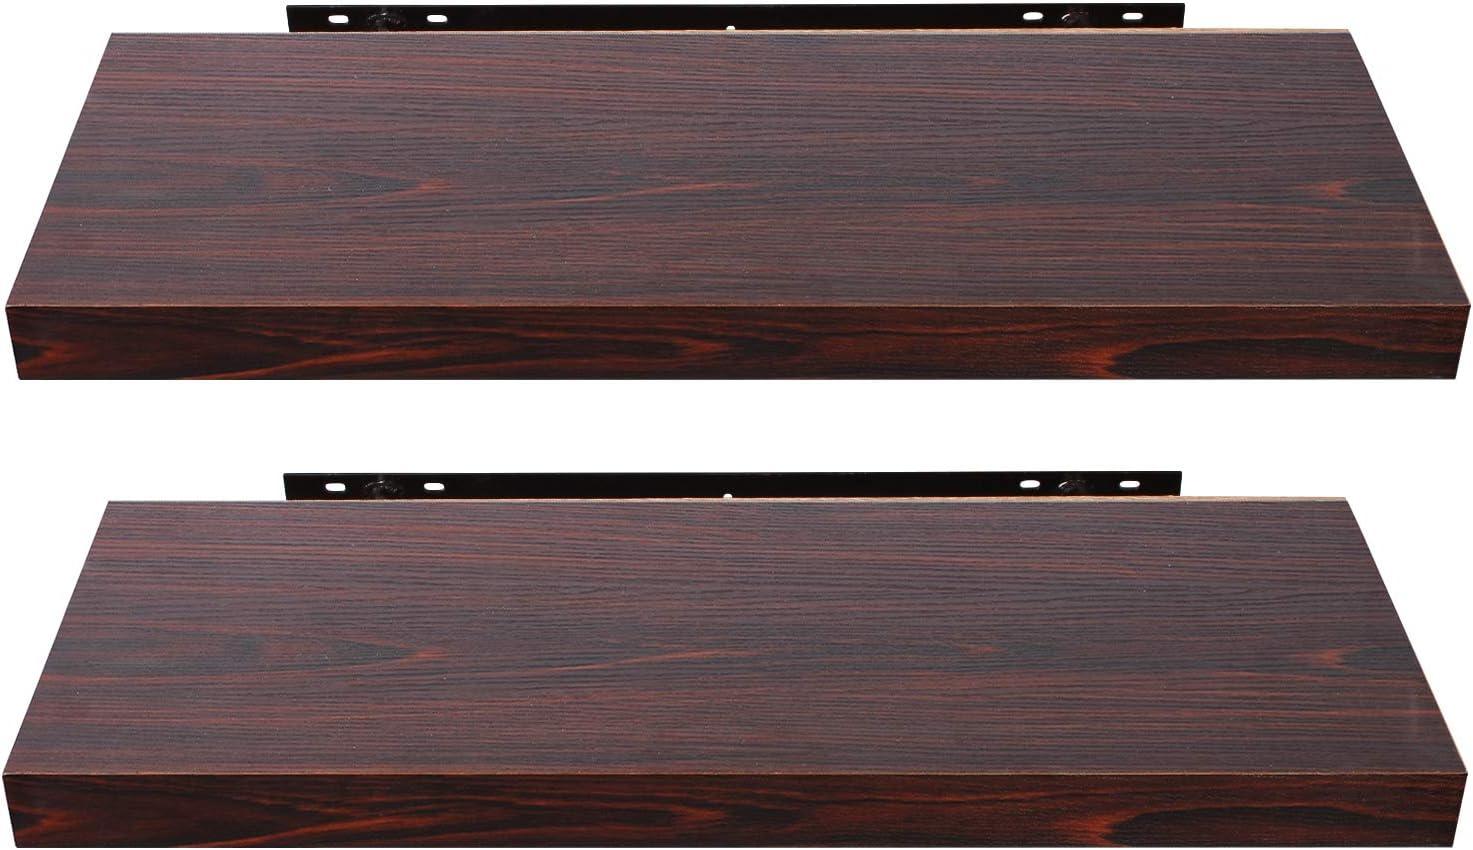 40cm Long EUGAD Pack of 2 Floating Shelvestm